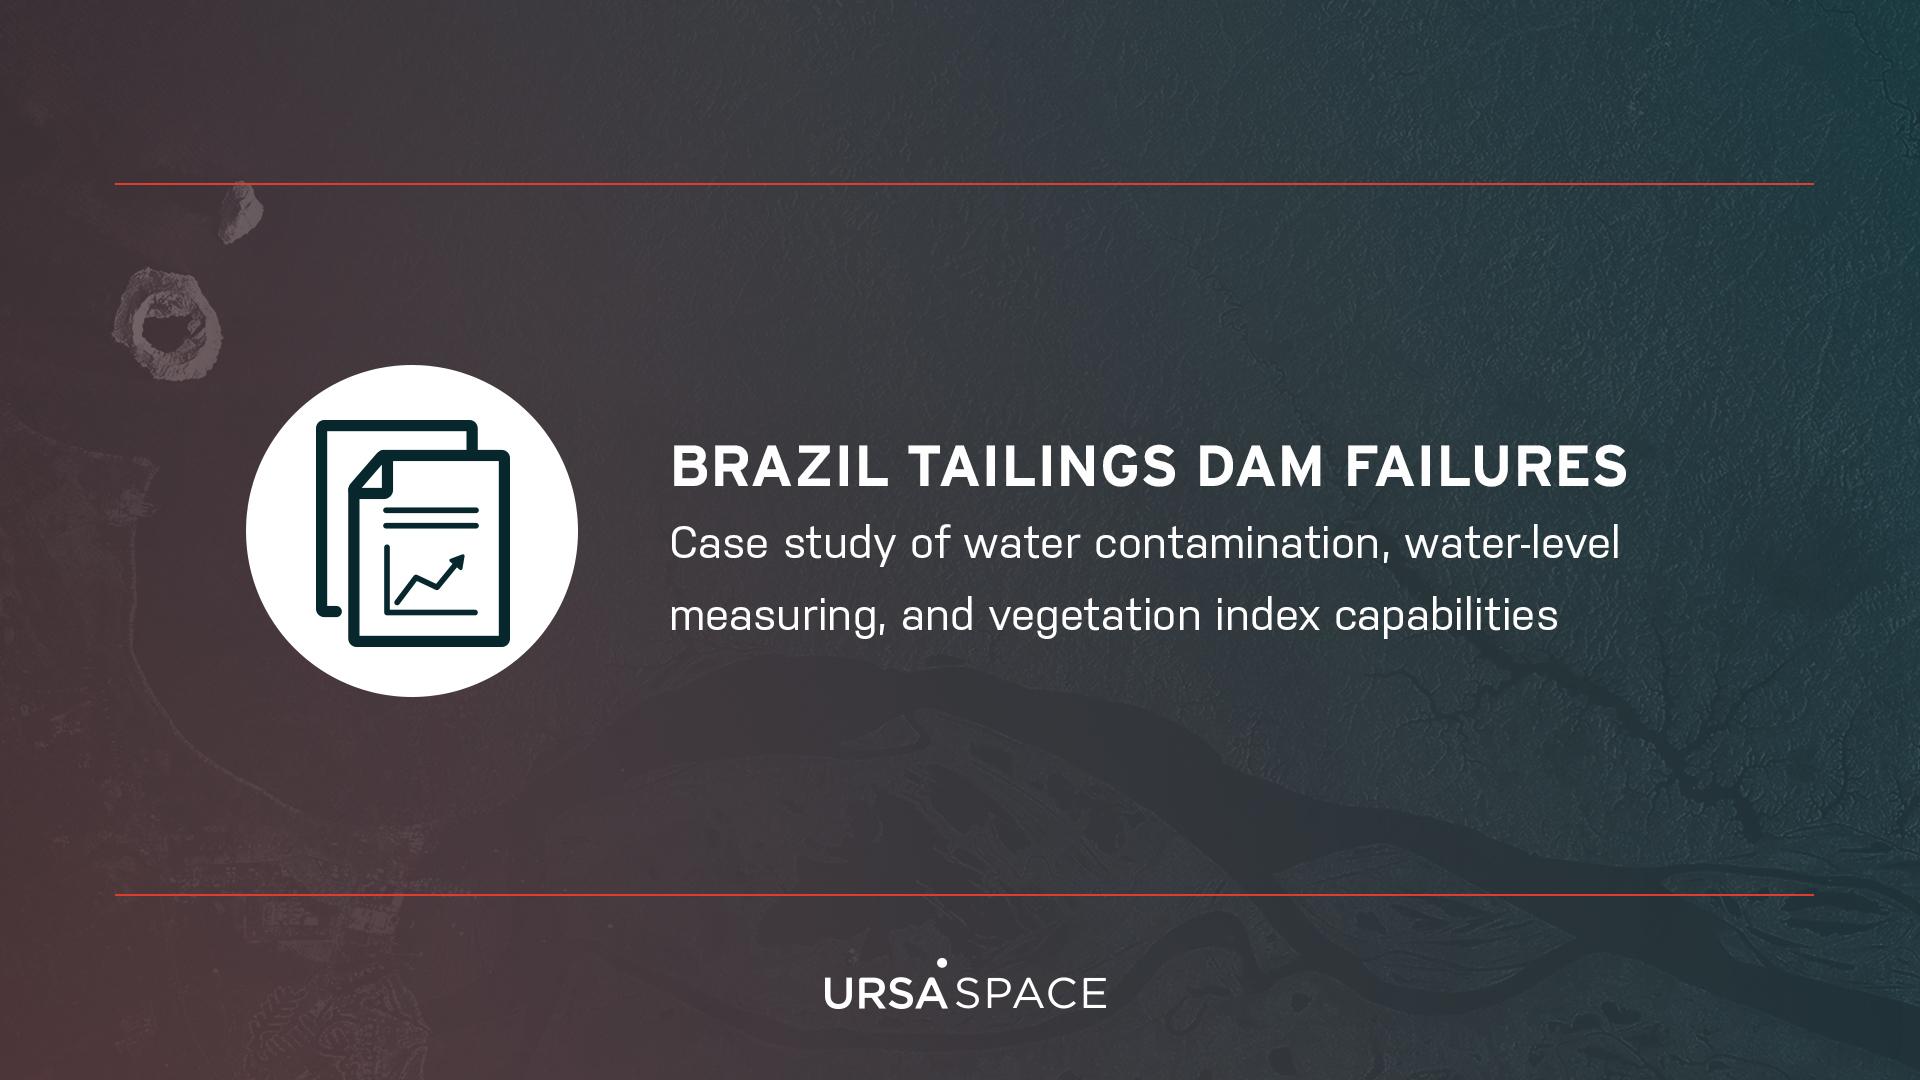 Brazil Tailings Dam Failures